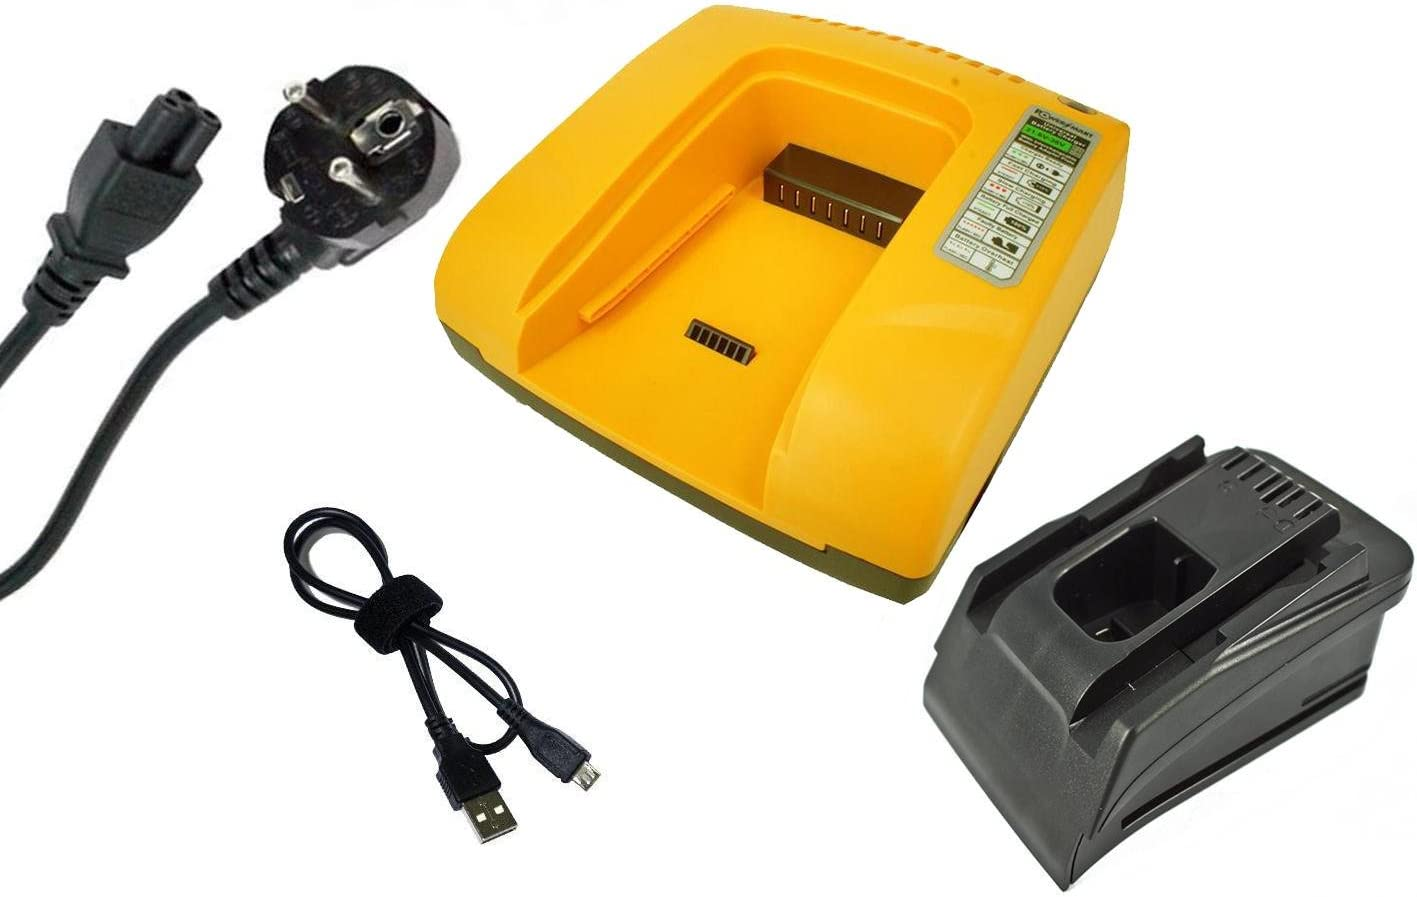 SCW 22-A WSR 22-A TE 2-A22 TE 4-A22 SFL 22-A box WSC 70-A36 PowerSmart/® 20V-36V Chargeur pour Hilti AG 125-A22 TE 7-A SIW 22-A SFH 22-A